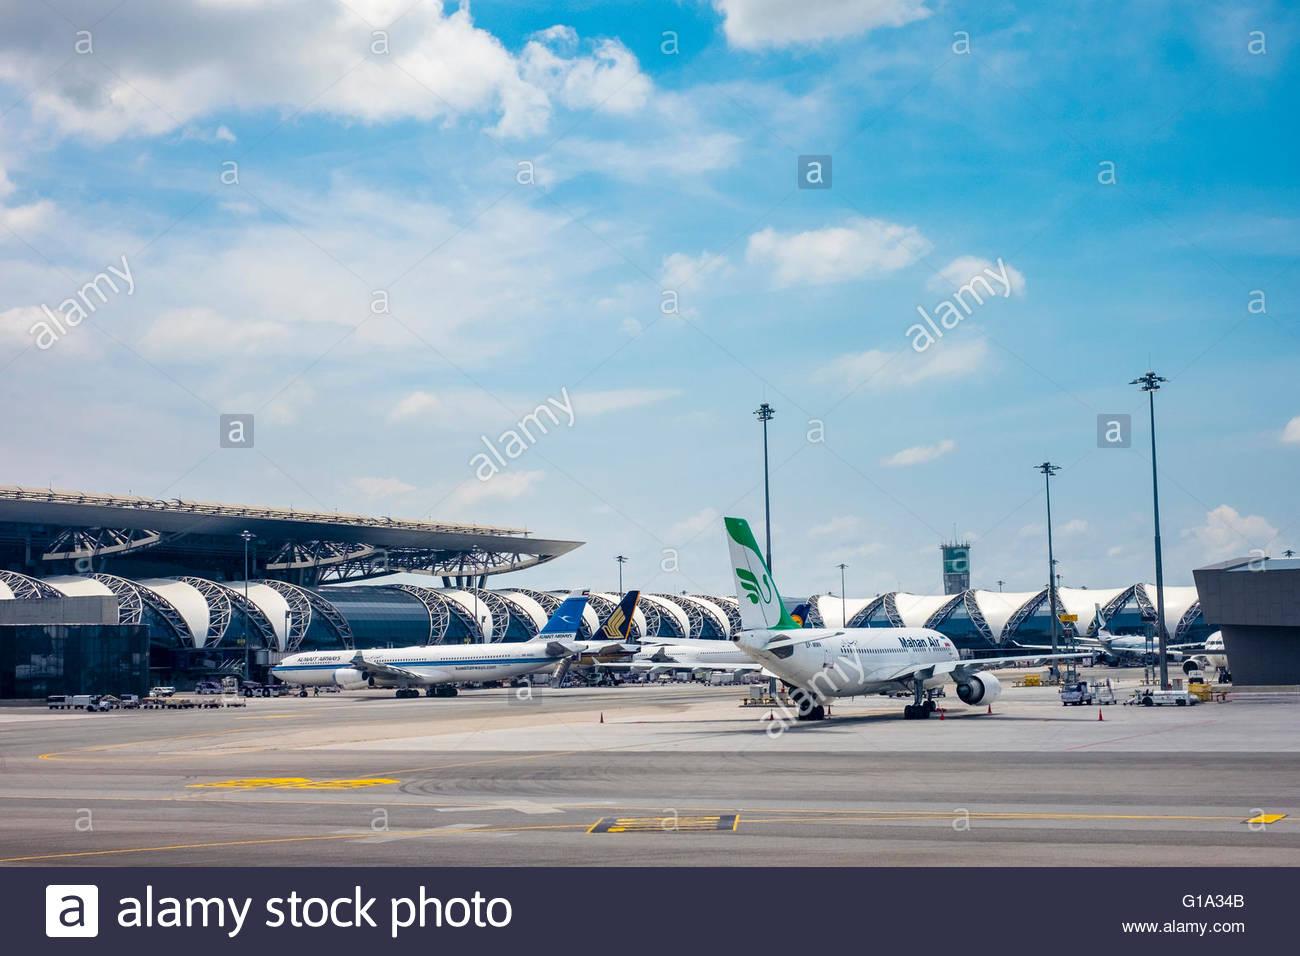 Airplanes at Suvarnabhumi International Airport, Bangkok, Thailand - Stock Image